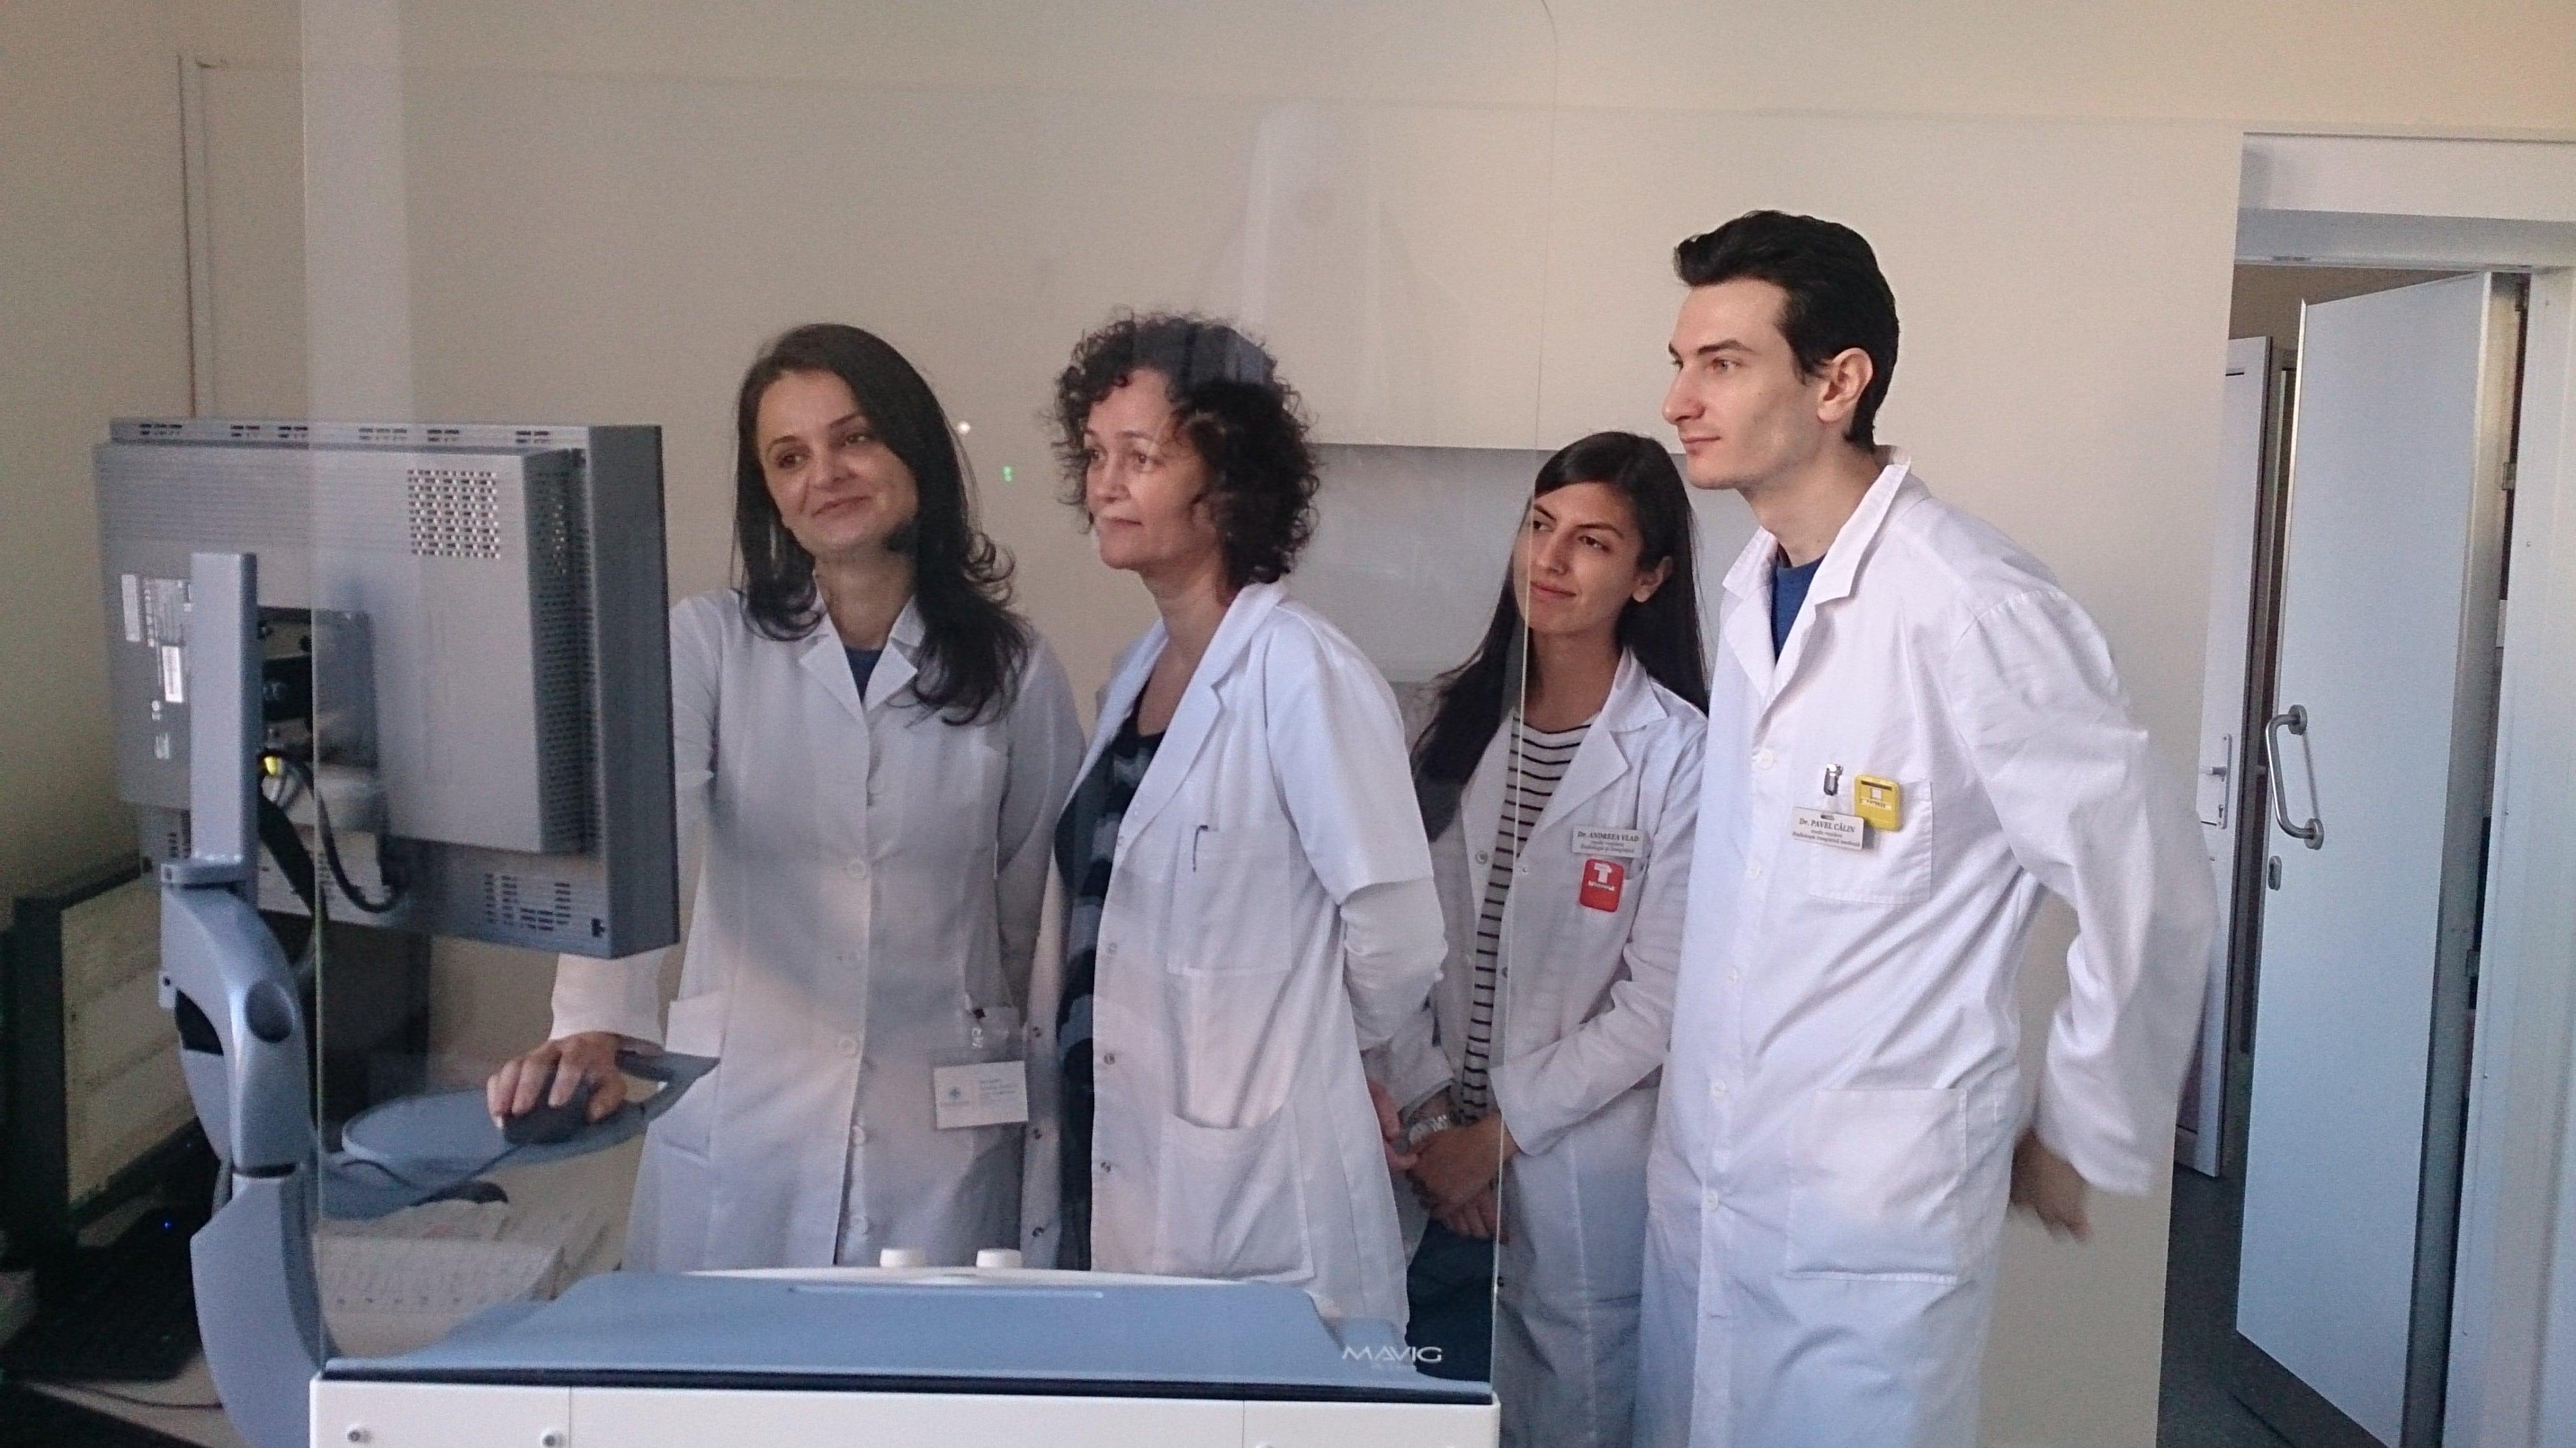 Mamograf ultraperformant